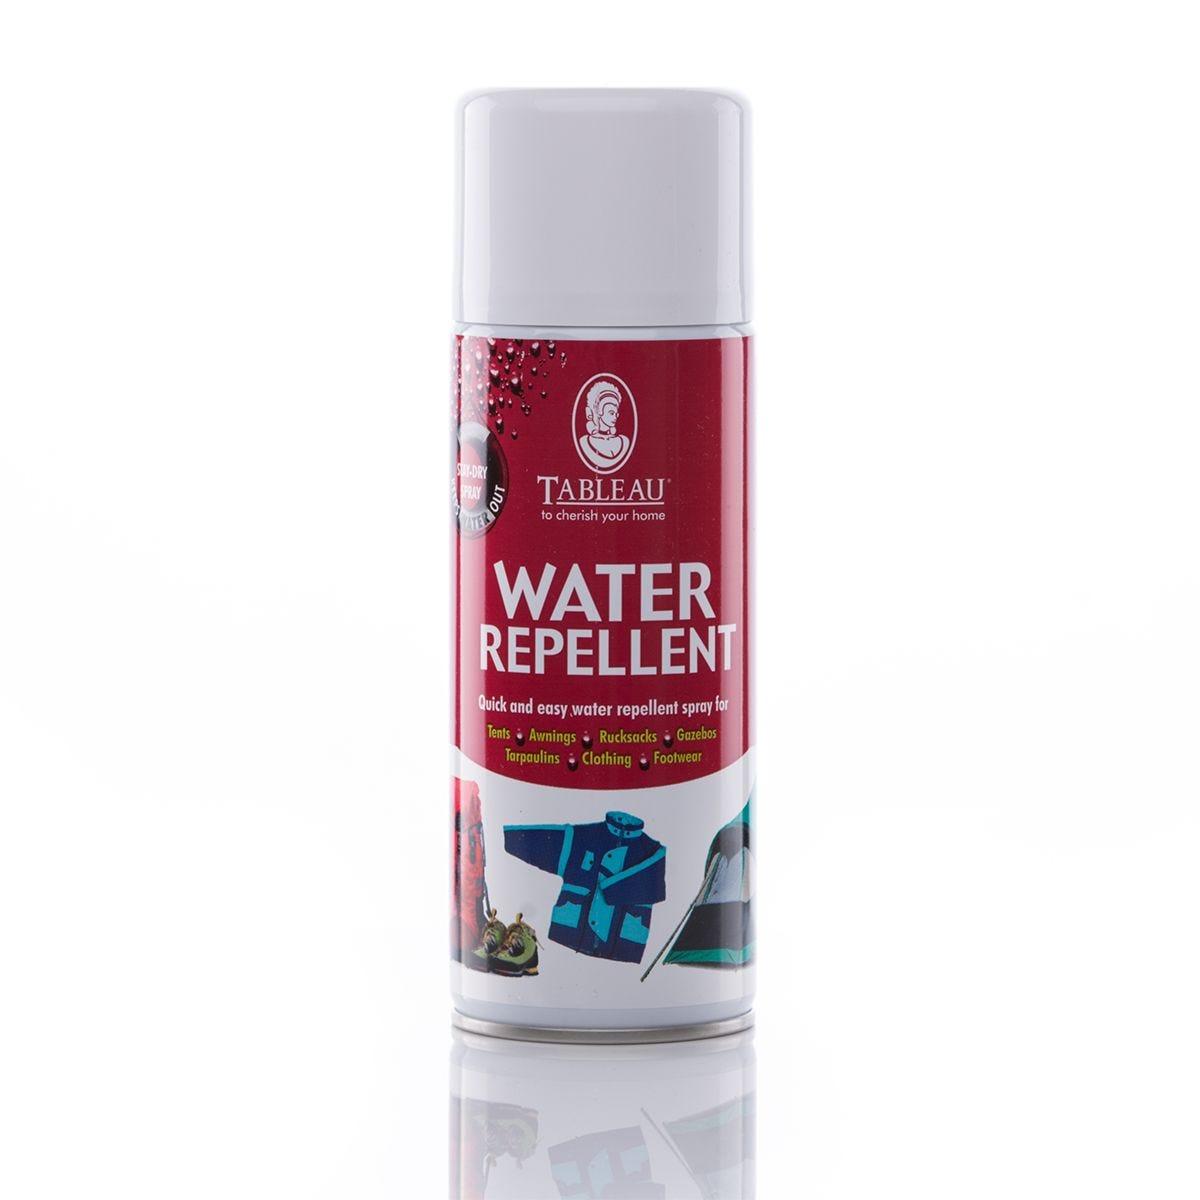 Tableau Water Repellent Spray - 400ml